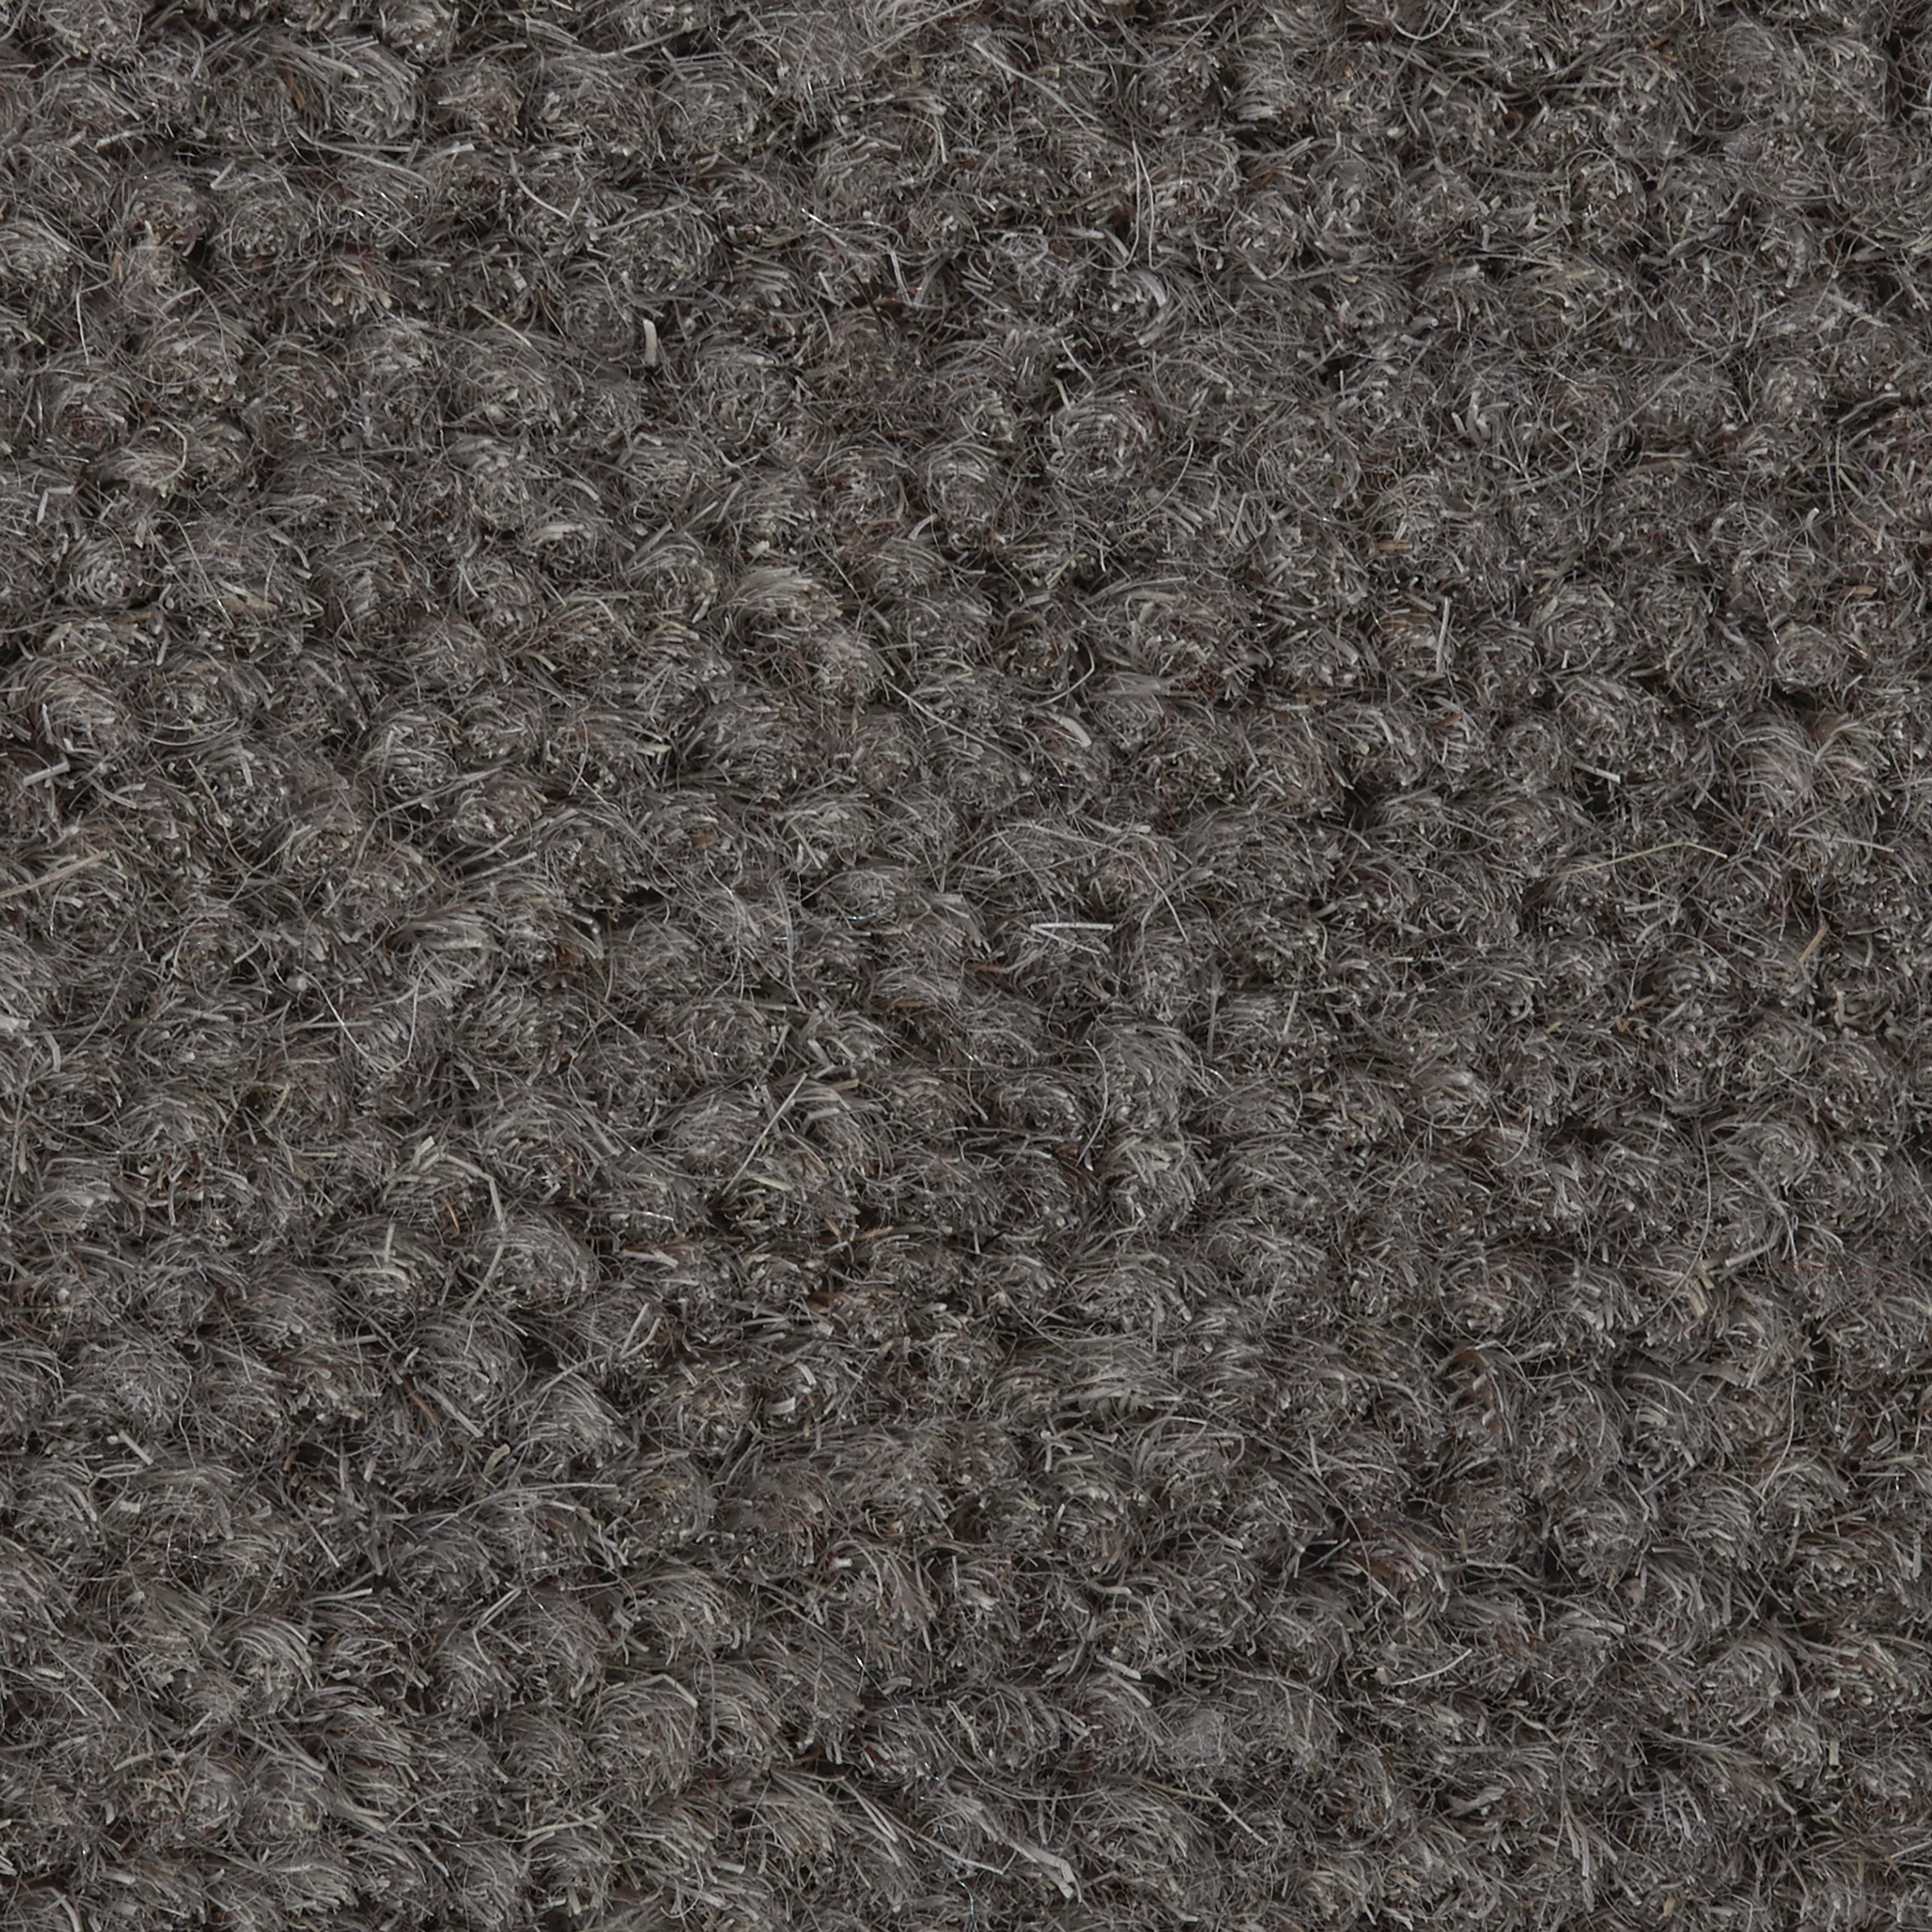 Handwebteppich Carolin 120x170cm - Grau, MODERN, Textil (120/170cm) - MÖMAX modern living